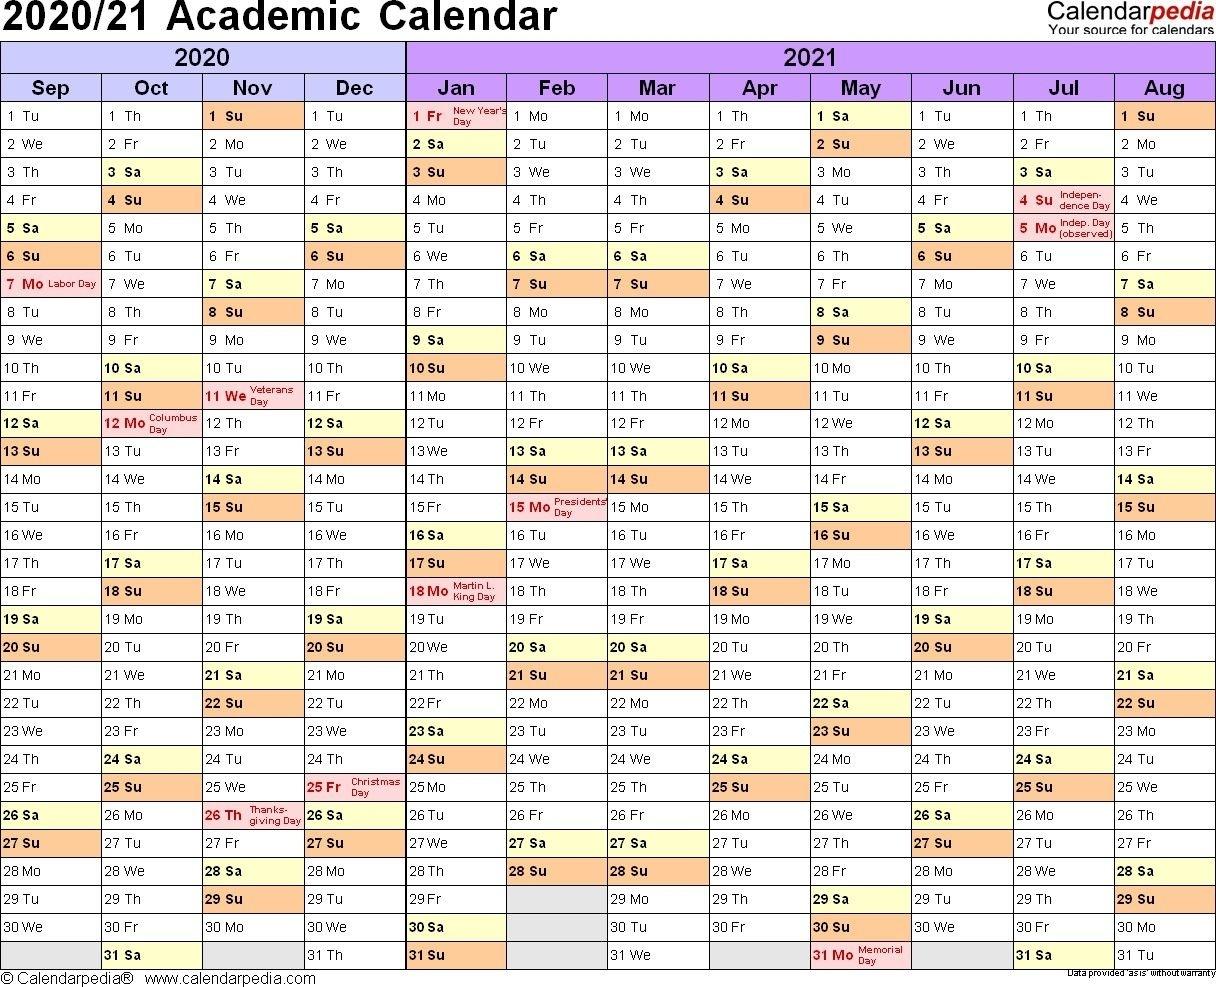 2021 And 2020 Calendar Printable Academic In 2020 | School